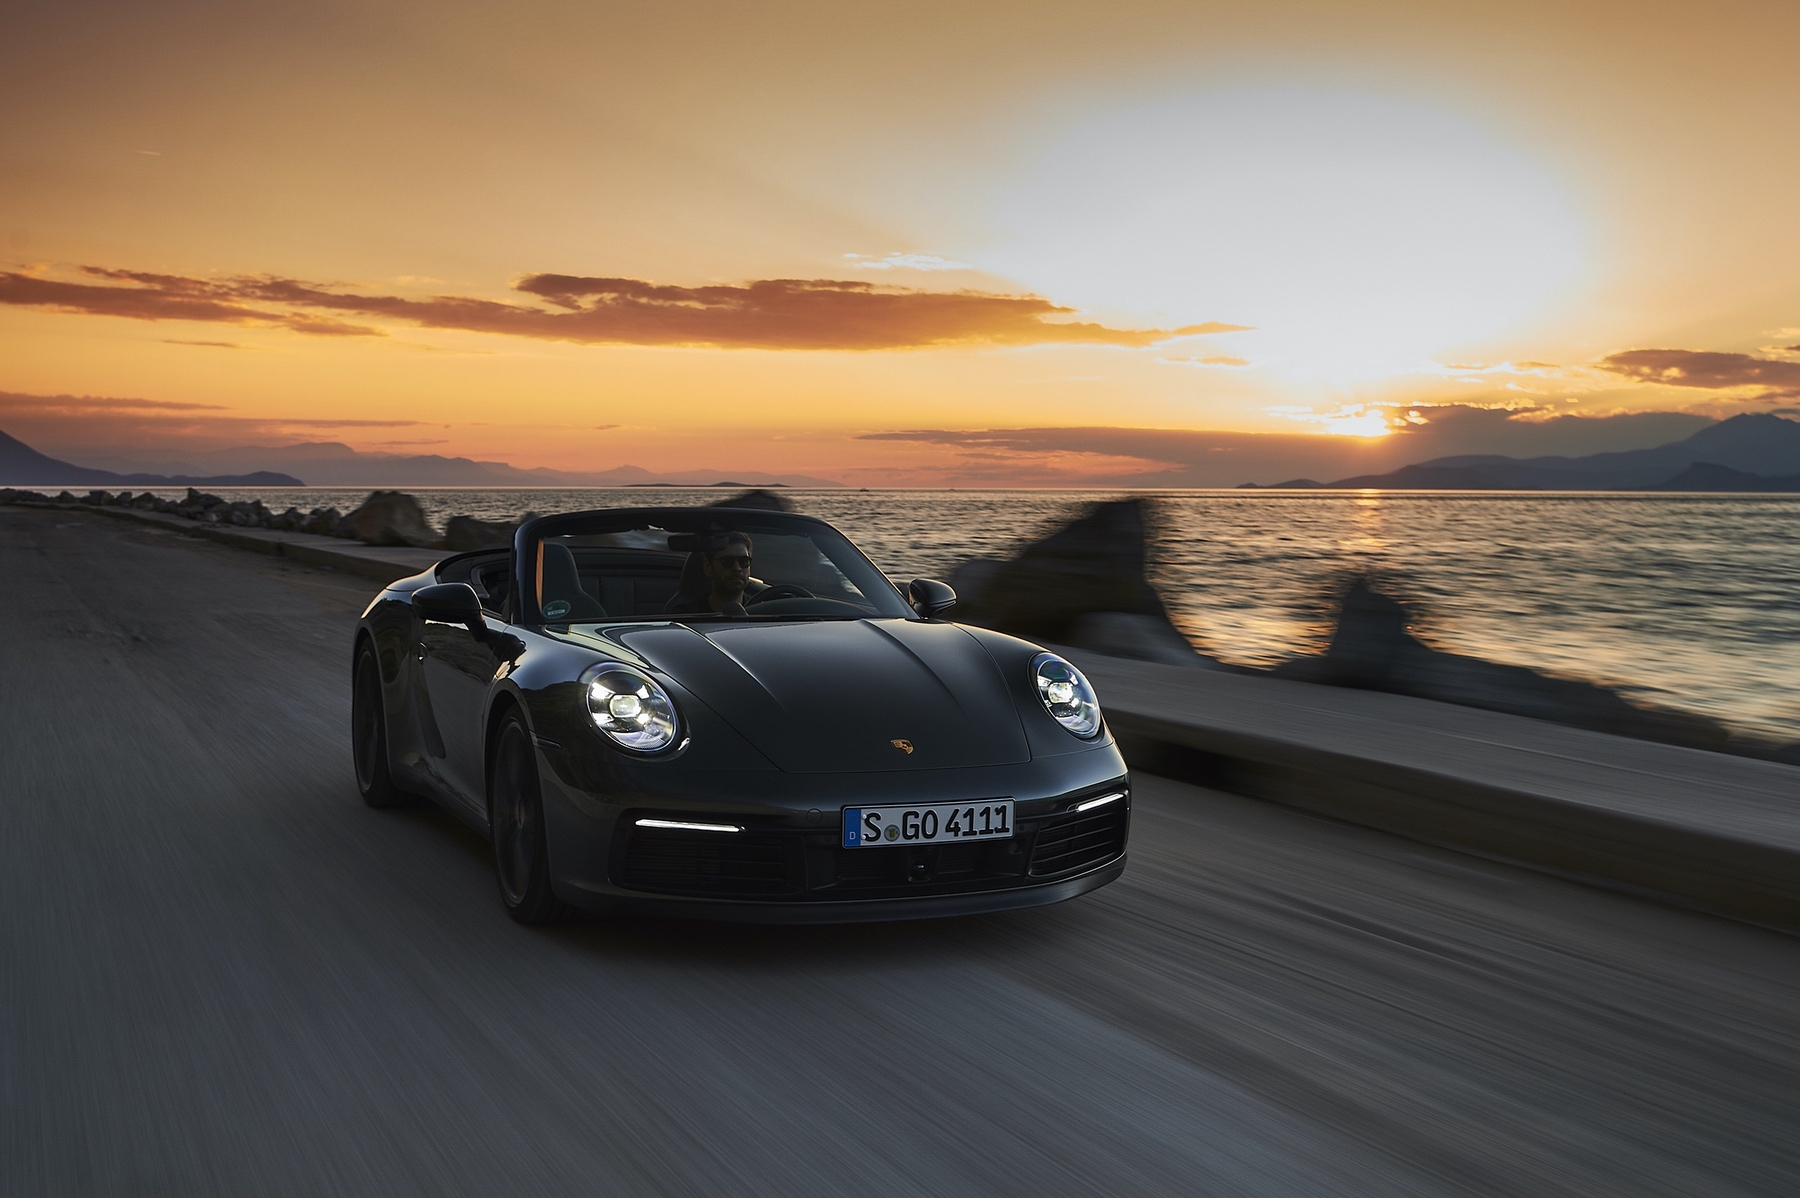 Test_Drive_Porsche_911_Athens_0056